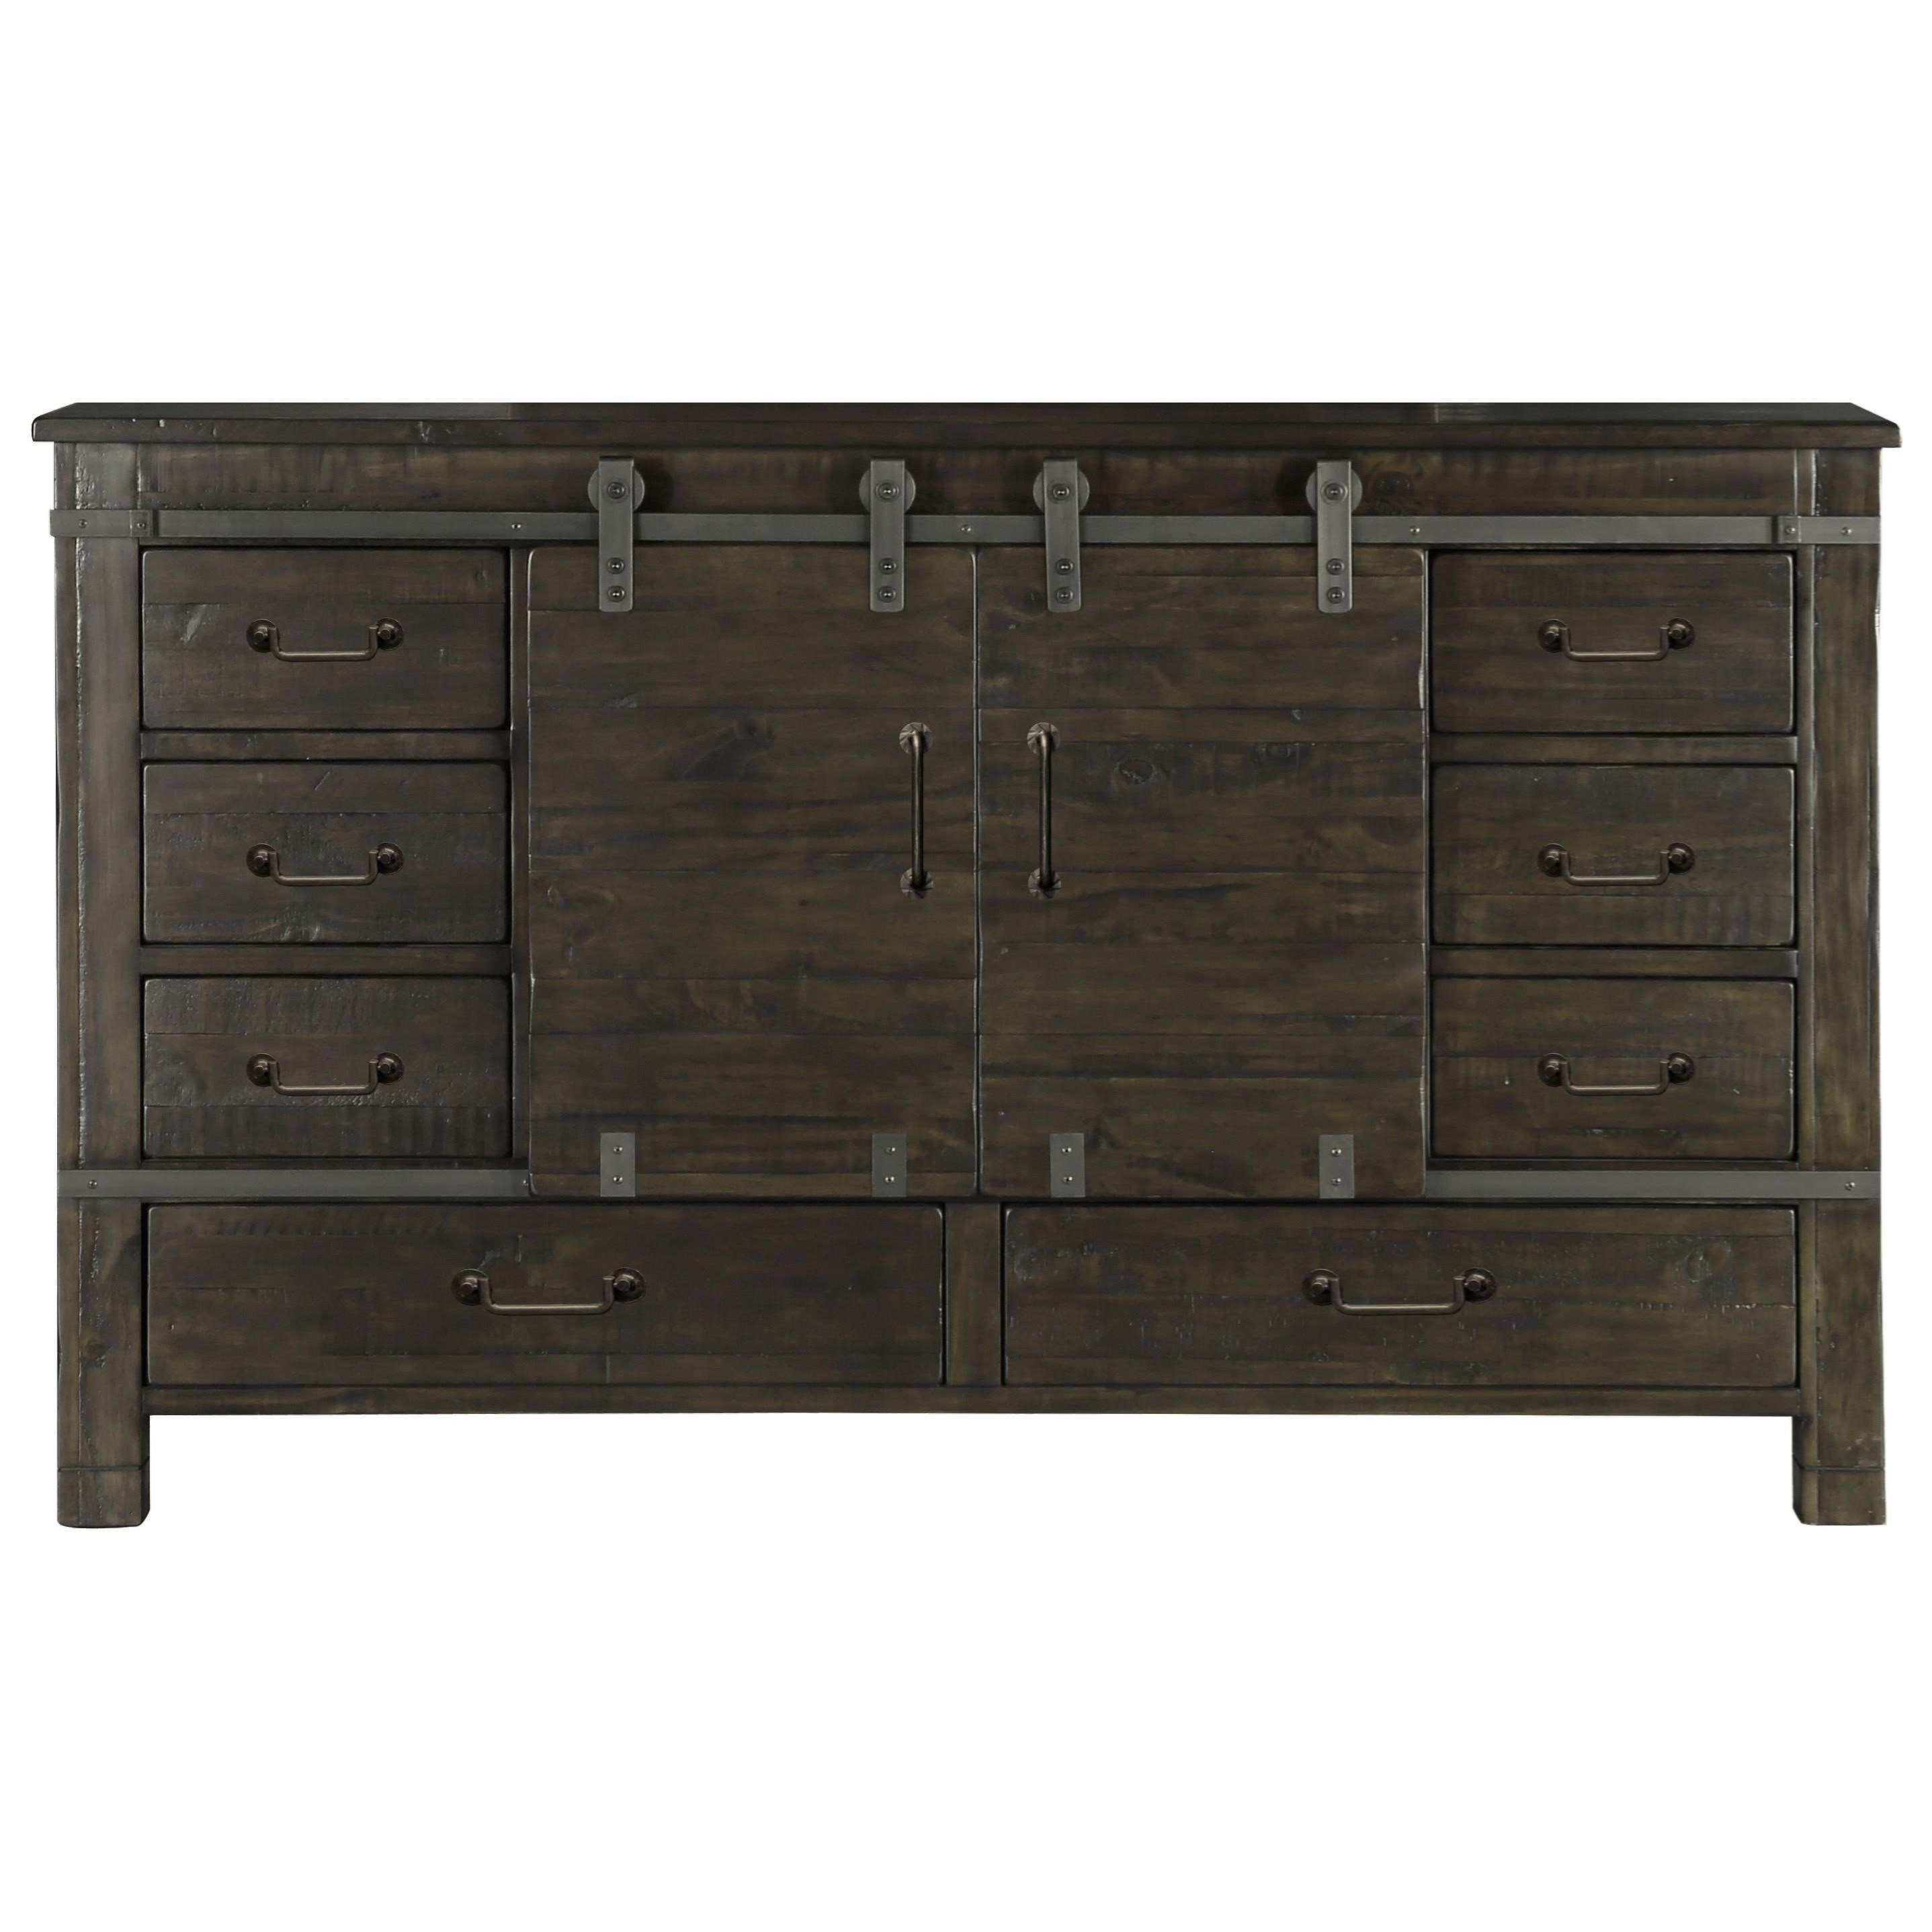 Abington Sliding Door Dresser by Magnussen Home at Dunk & Bright Furniture